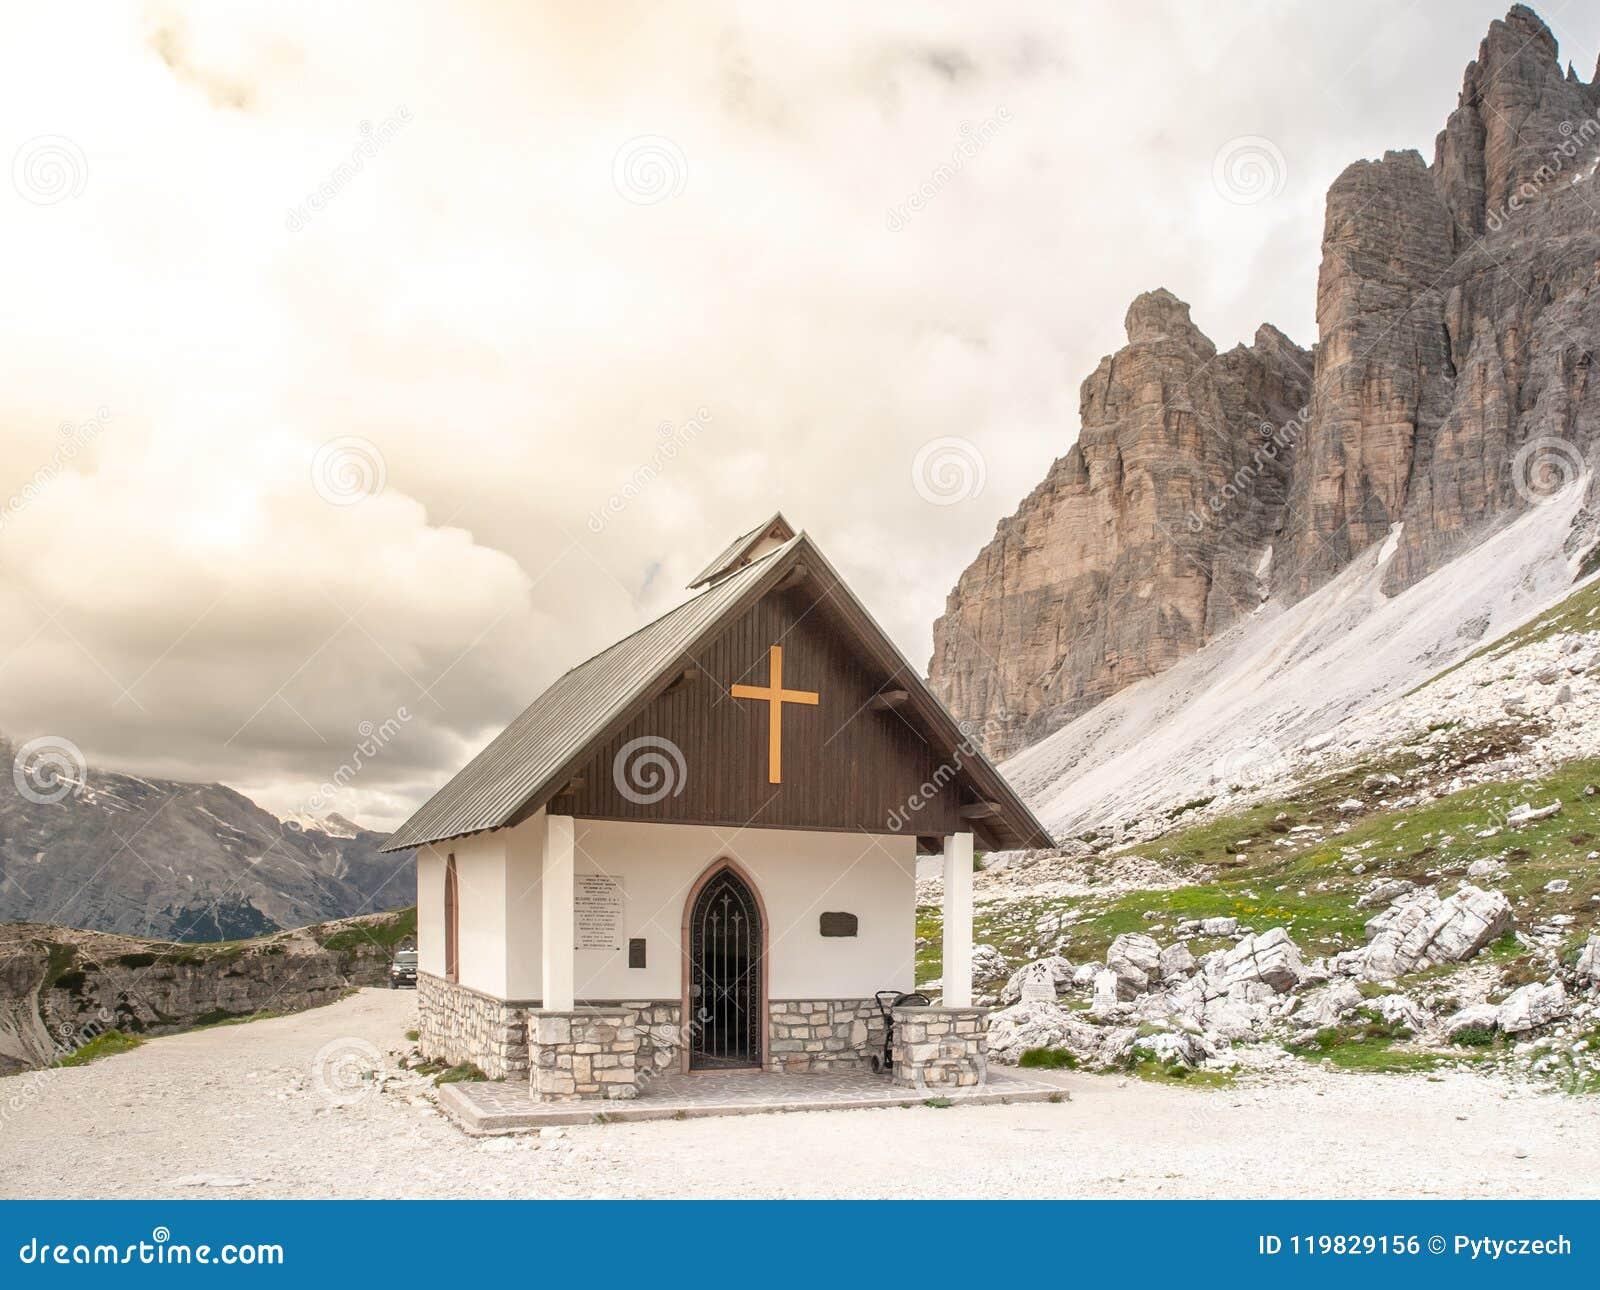 Kleine Gebirgskapelle, Cappella-degli Alpini, bei Tre Cime di Lavaredo, Dolomit, Italien